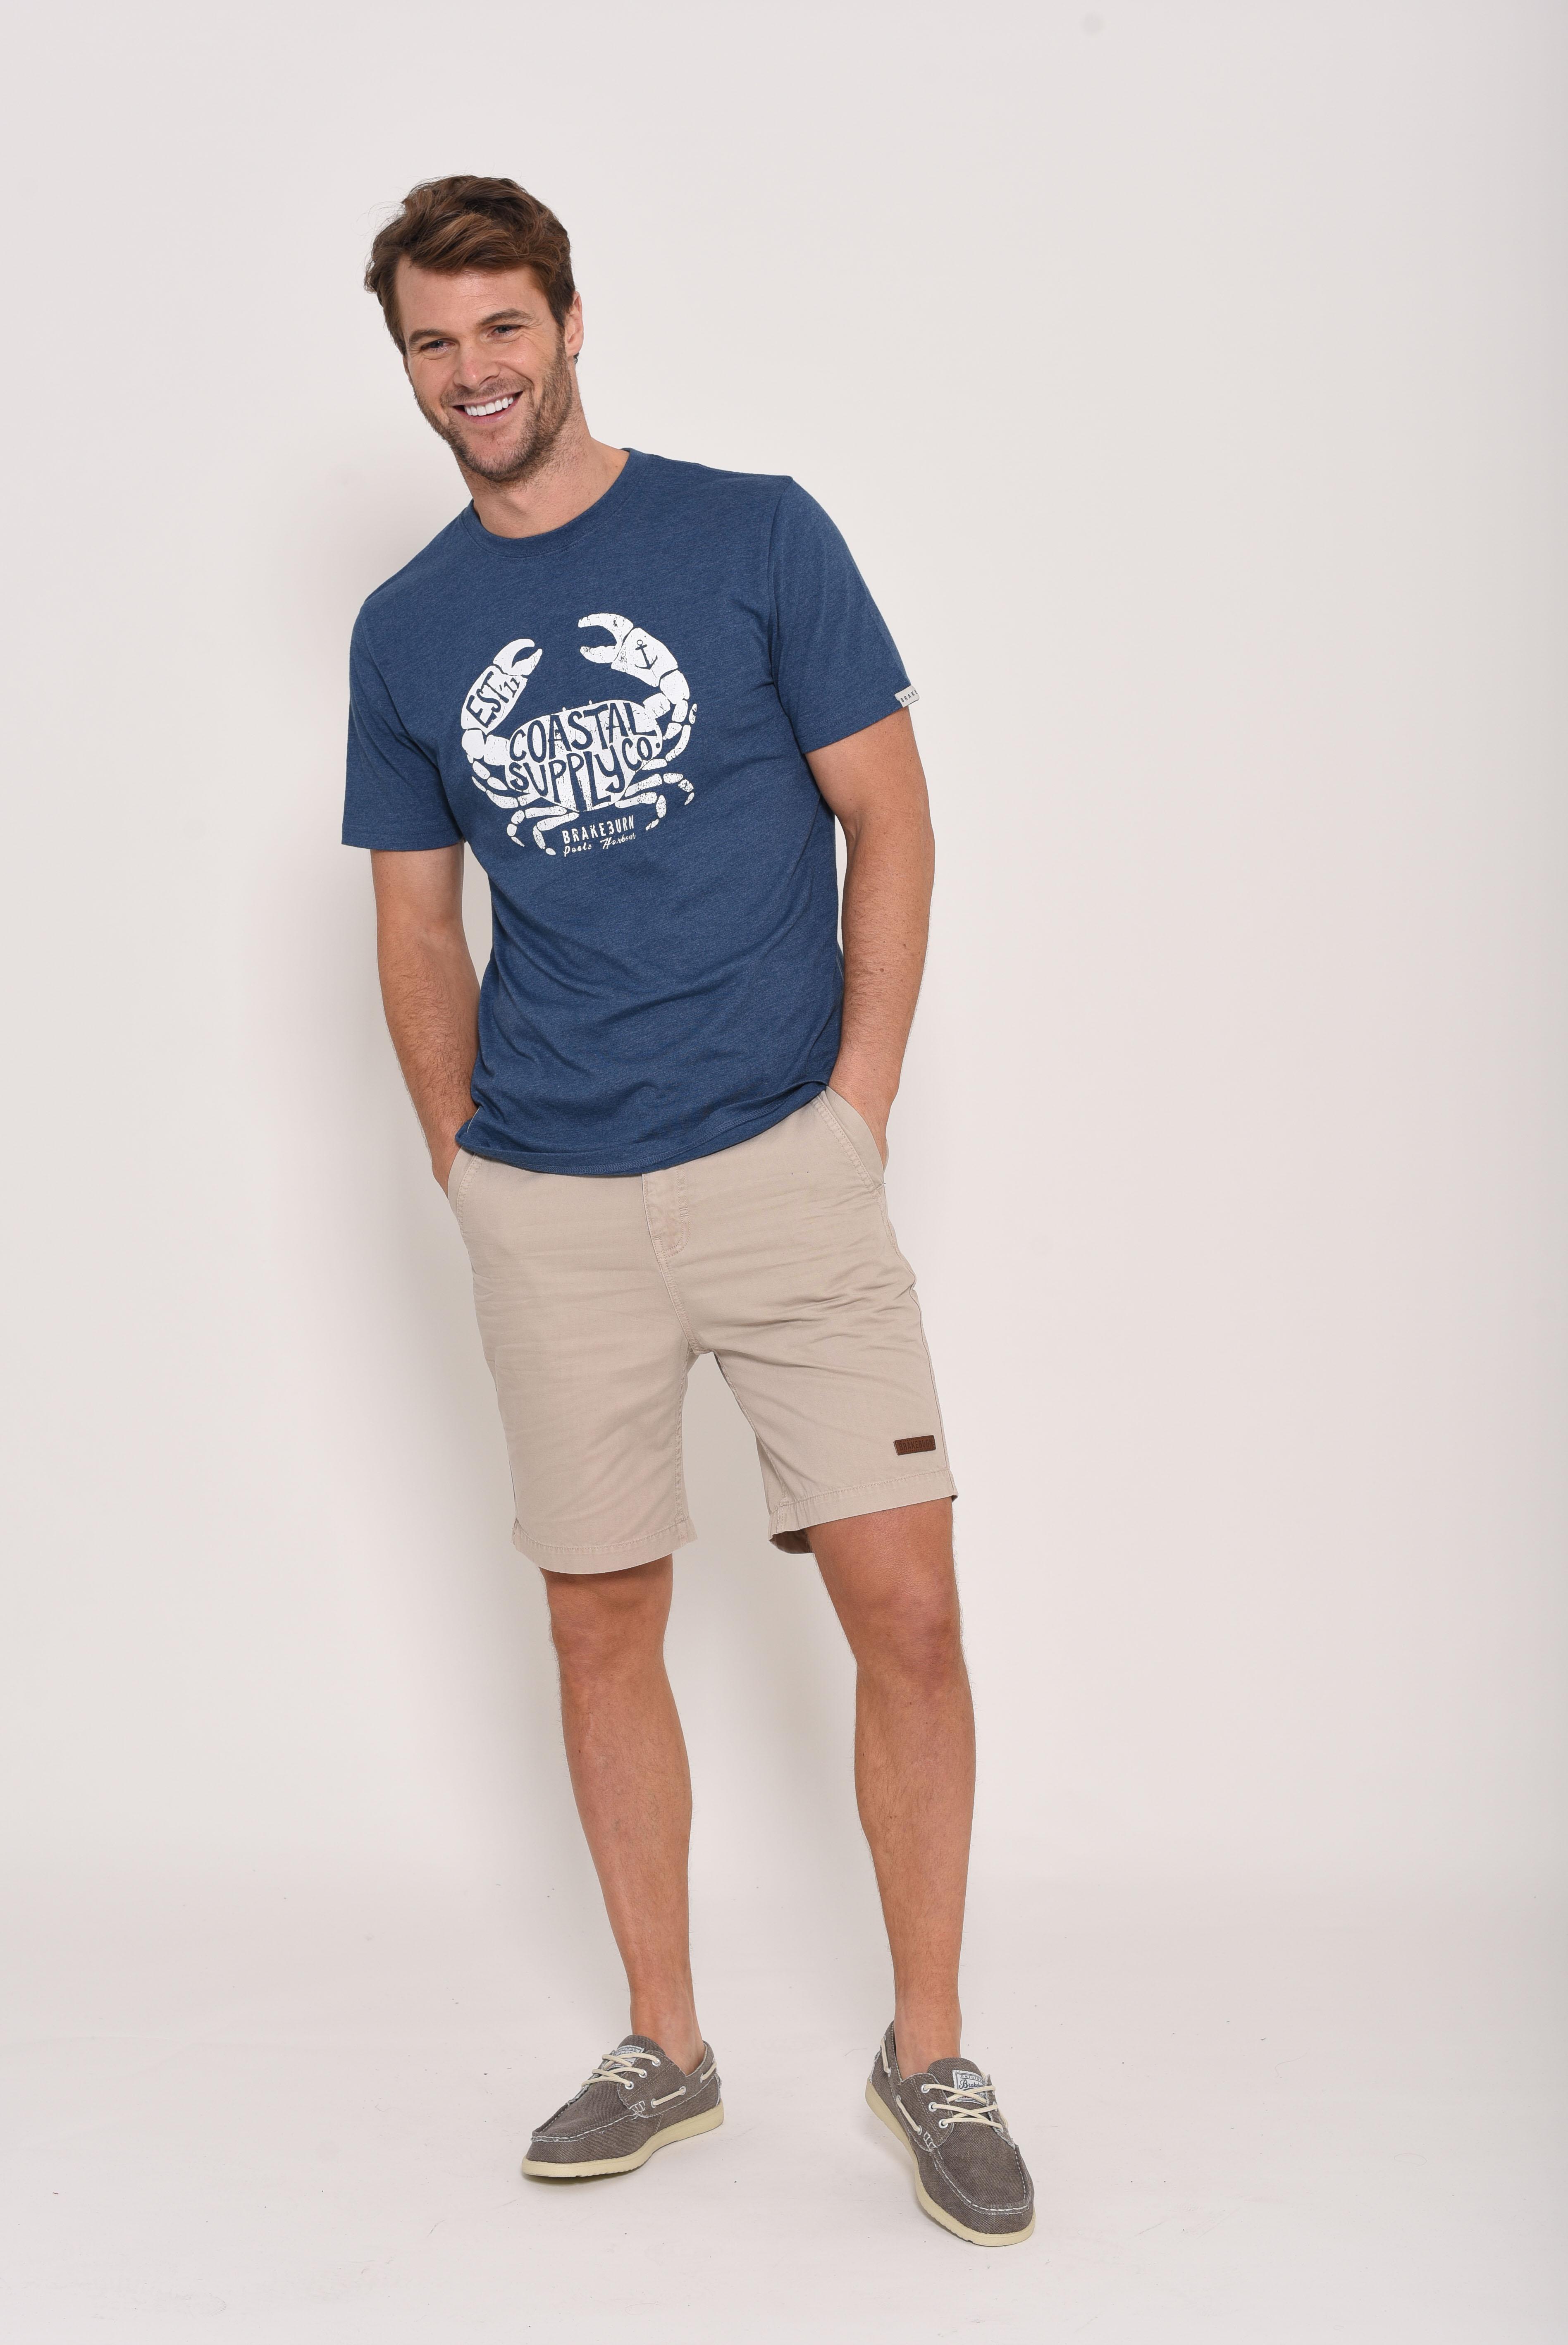 Brakeburn Coastal Supply T-Shirt - Navy